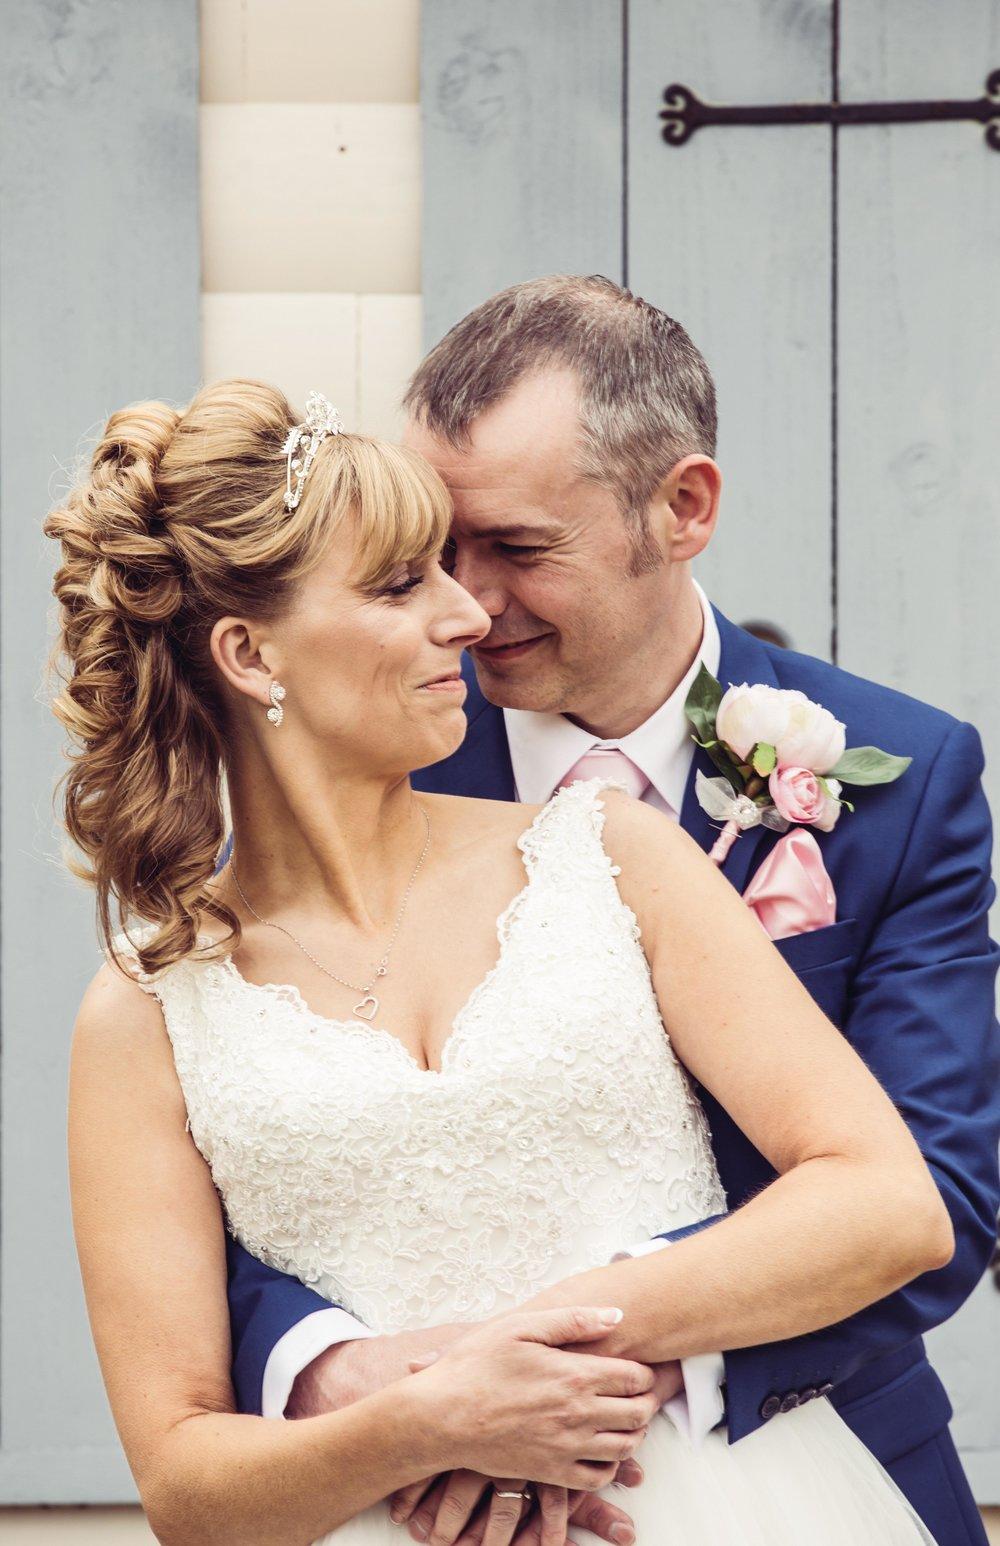 Simon & Michelle's Wedding_Helen Cotton Photography©_24.JPG